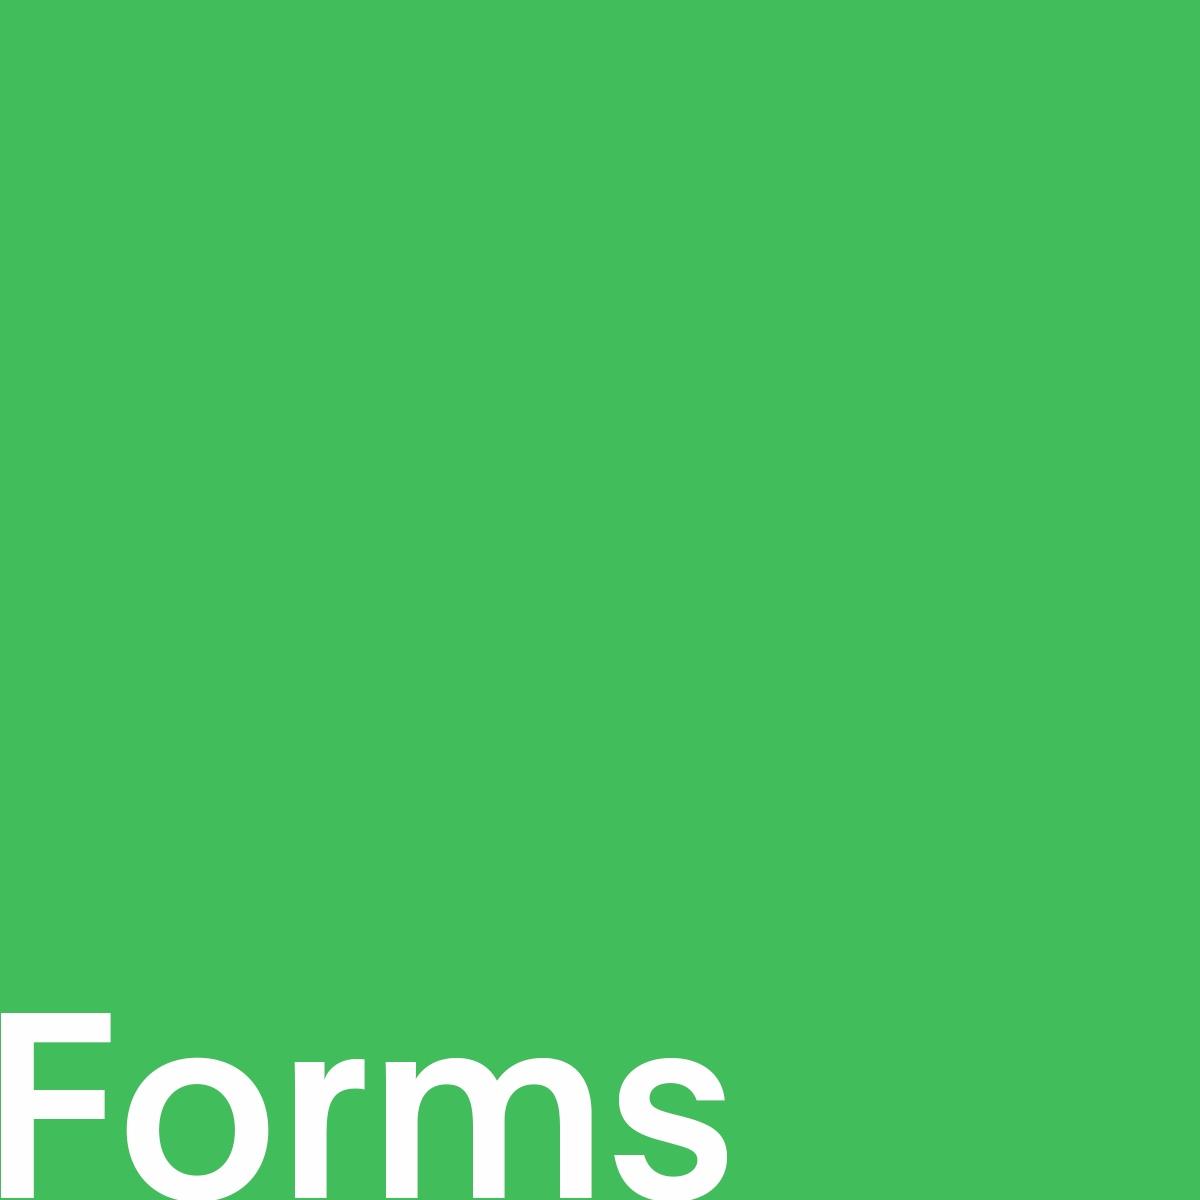 forms-green.jpg